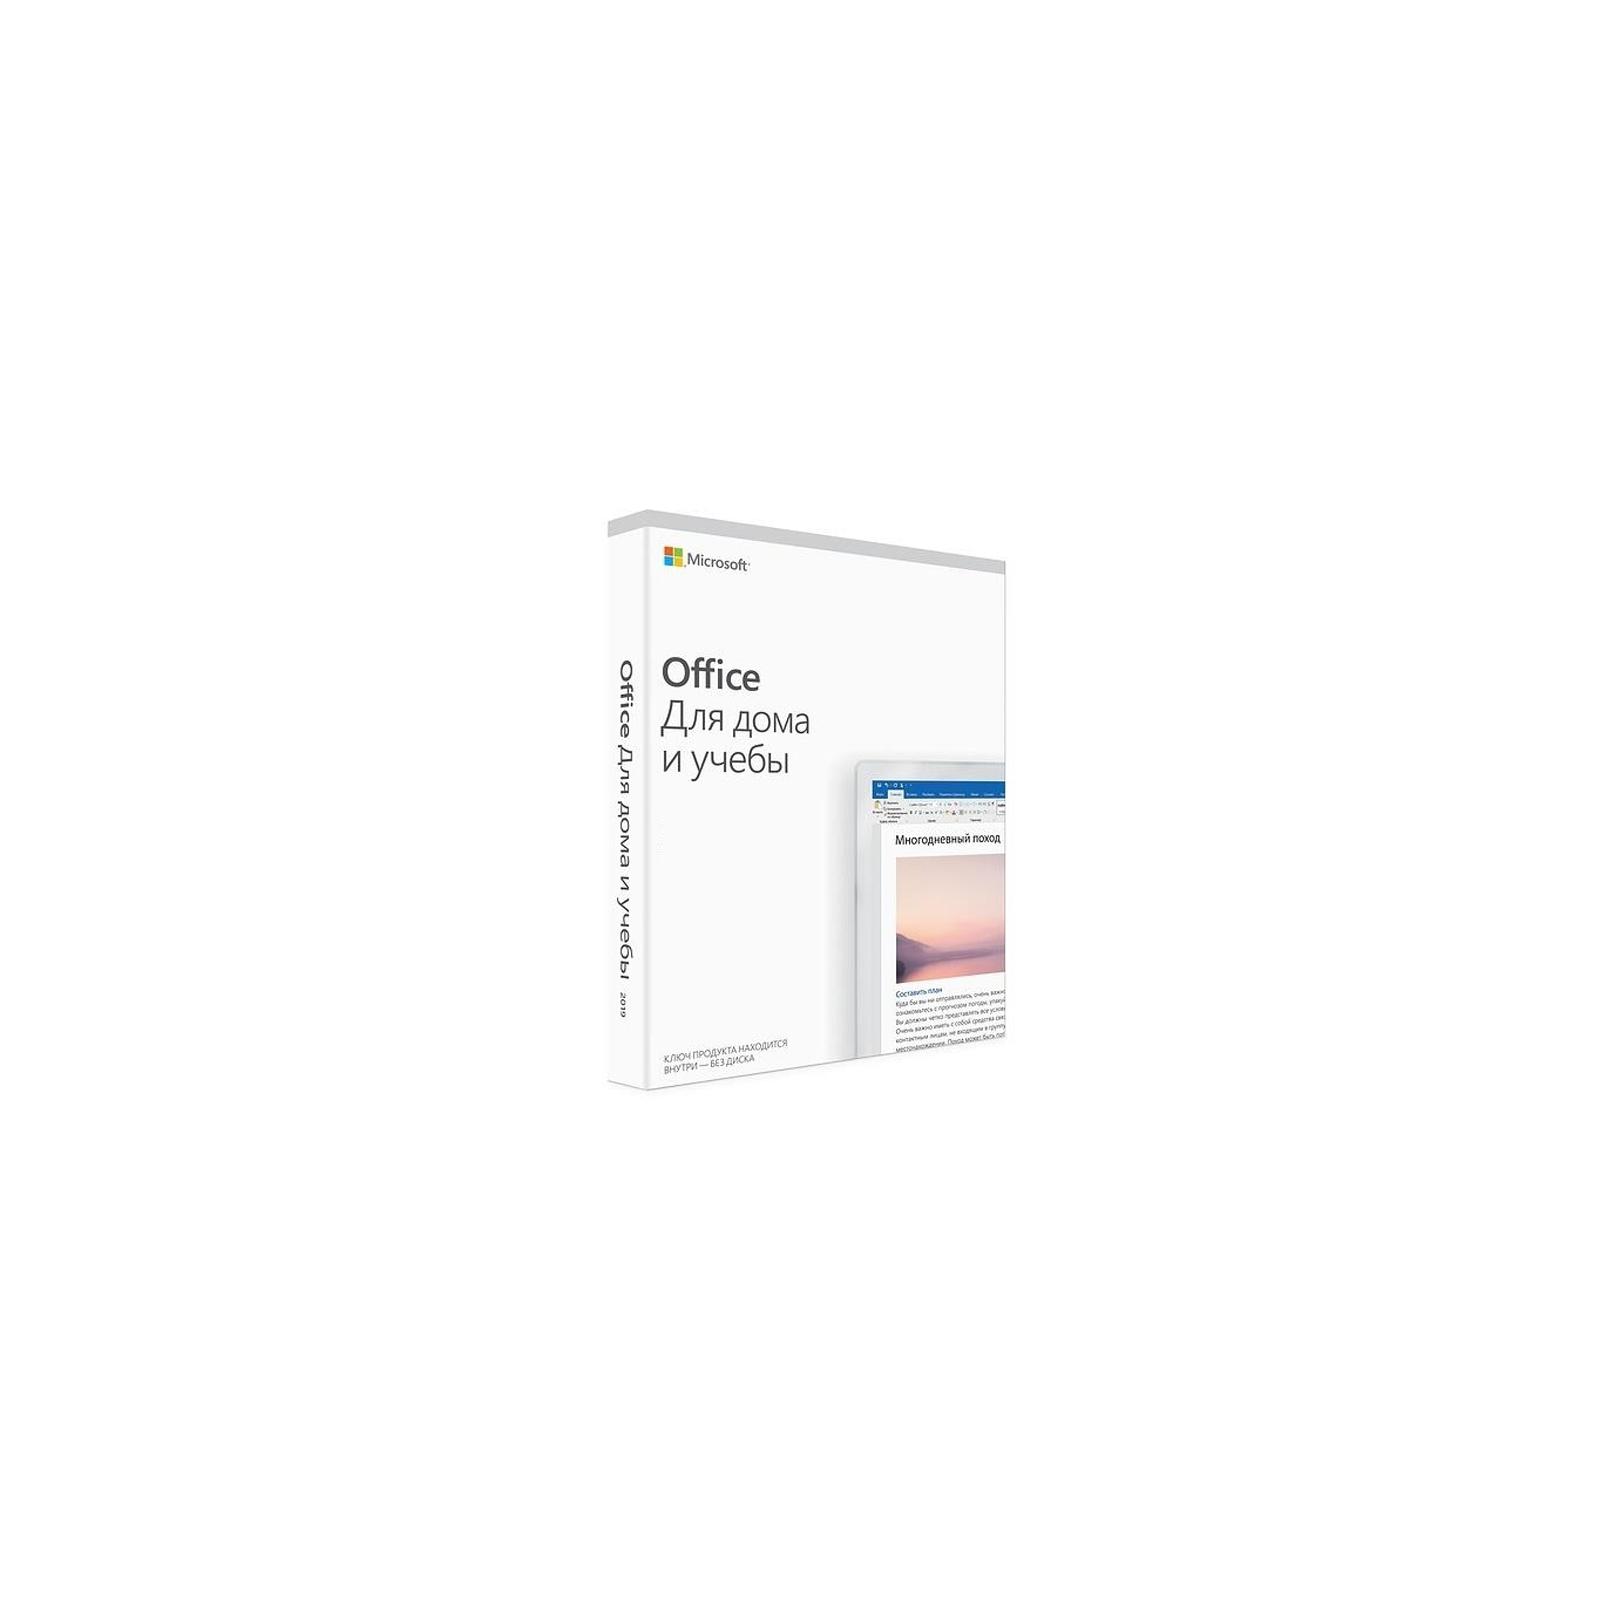 Офісний додаток Microsoft Office 2019 Home and Student Russian Medialess P6 (79G-05208)